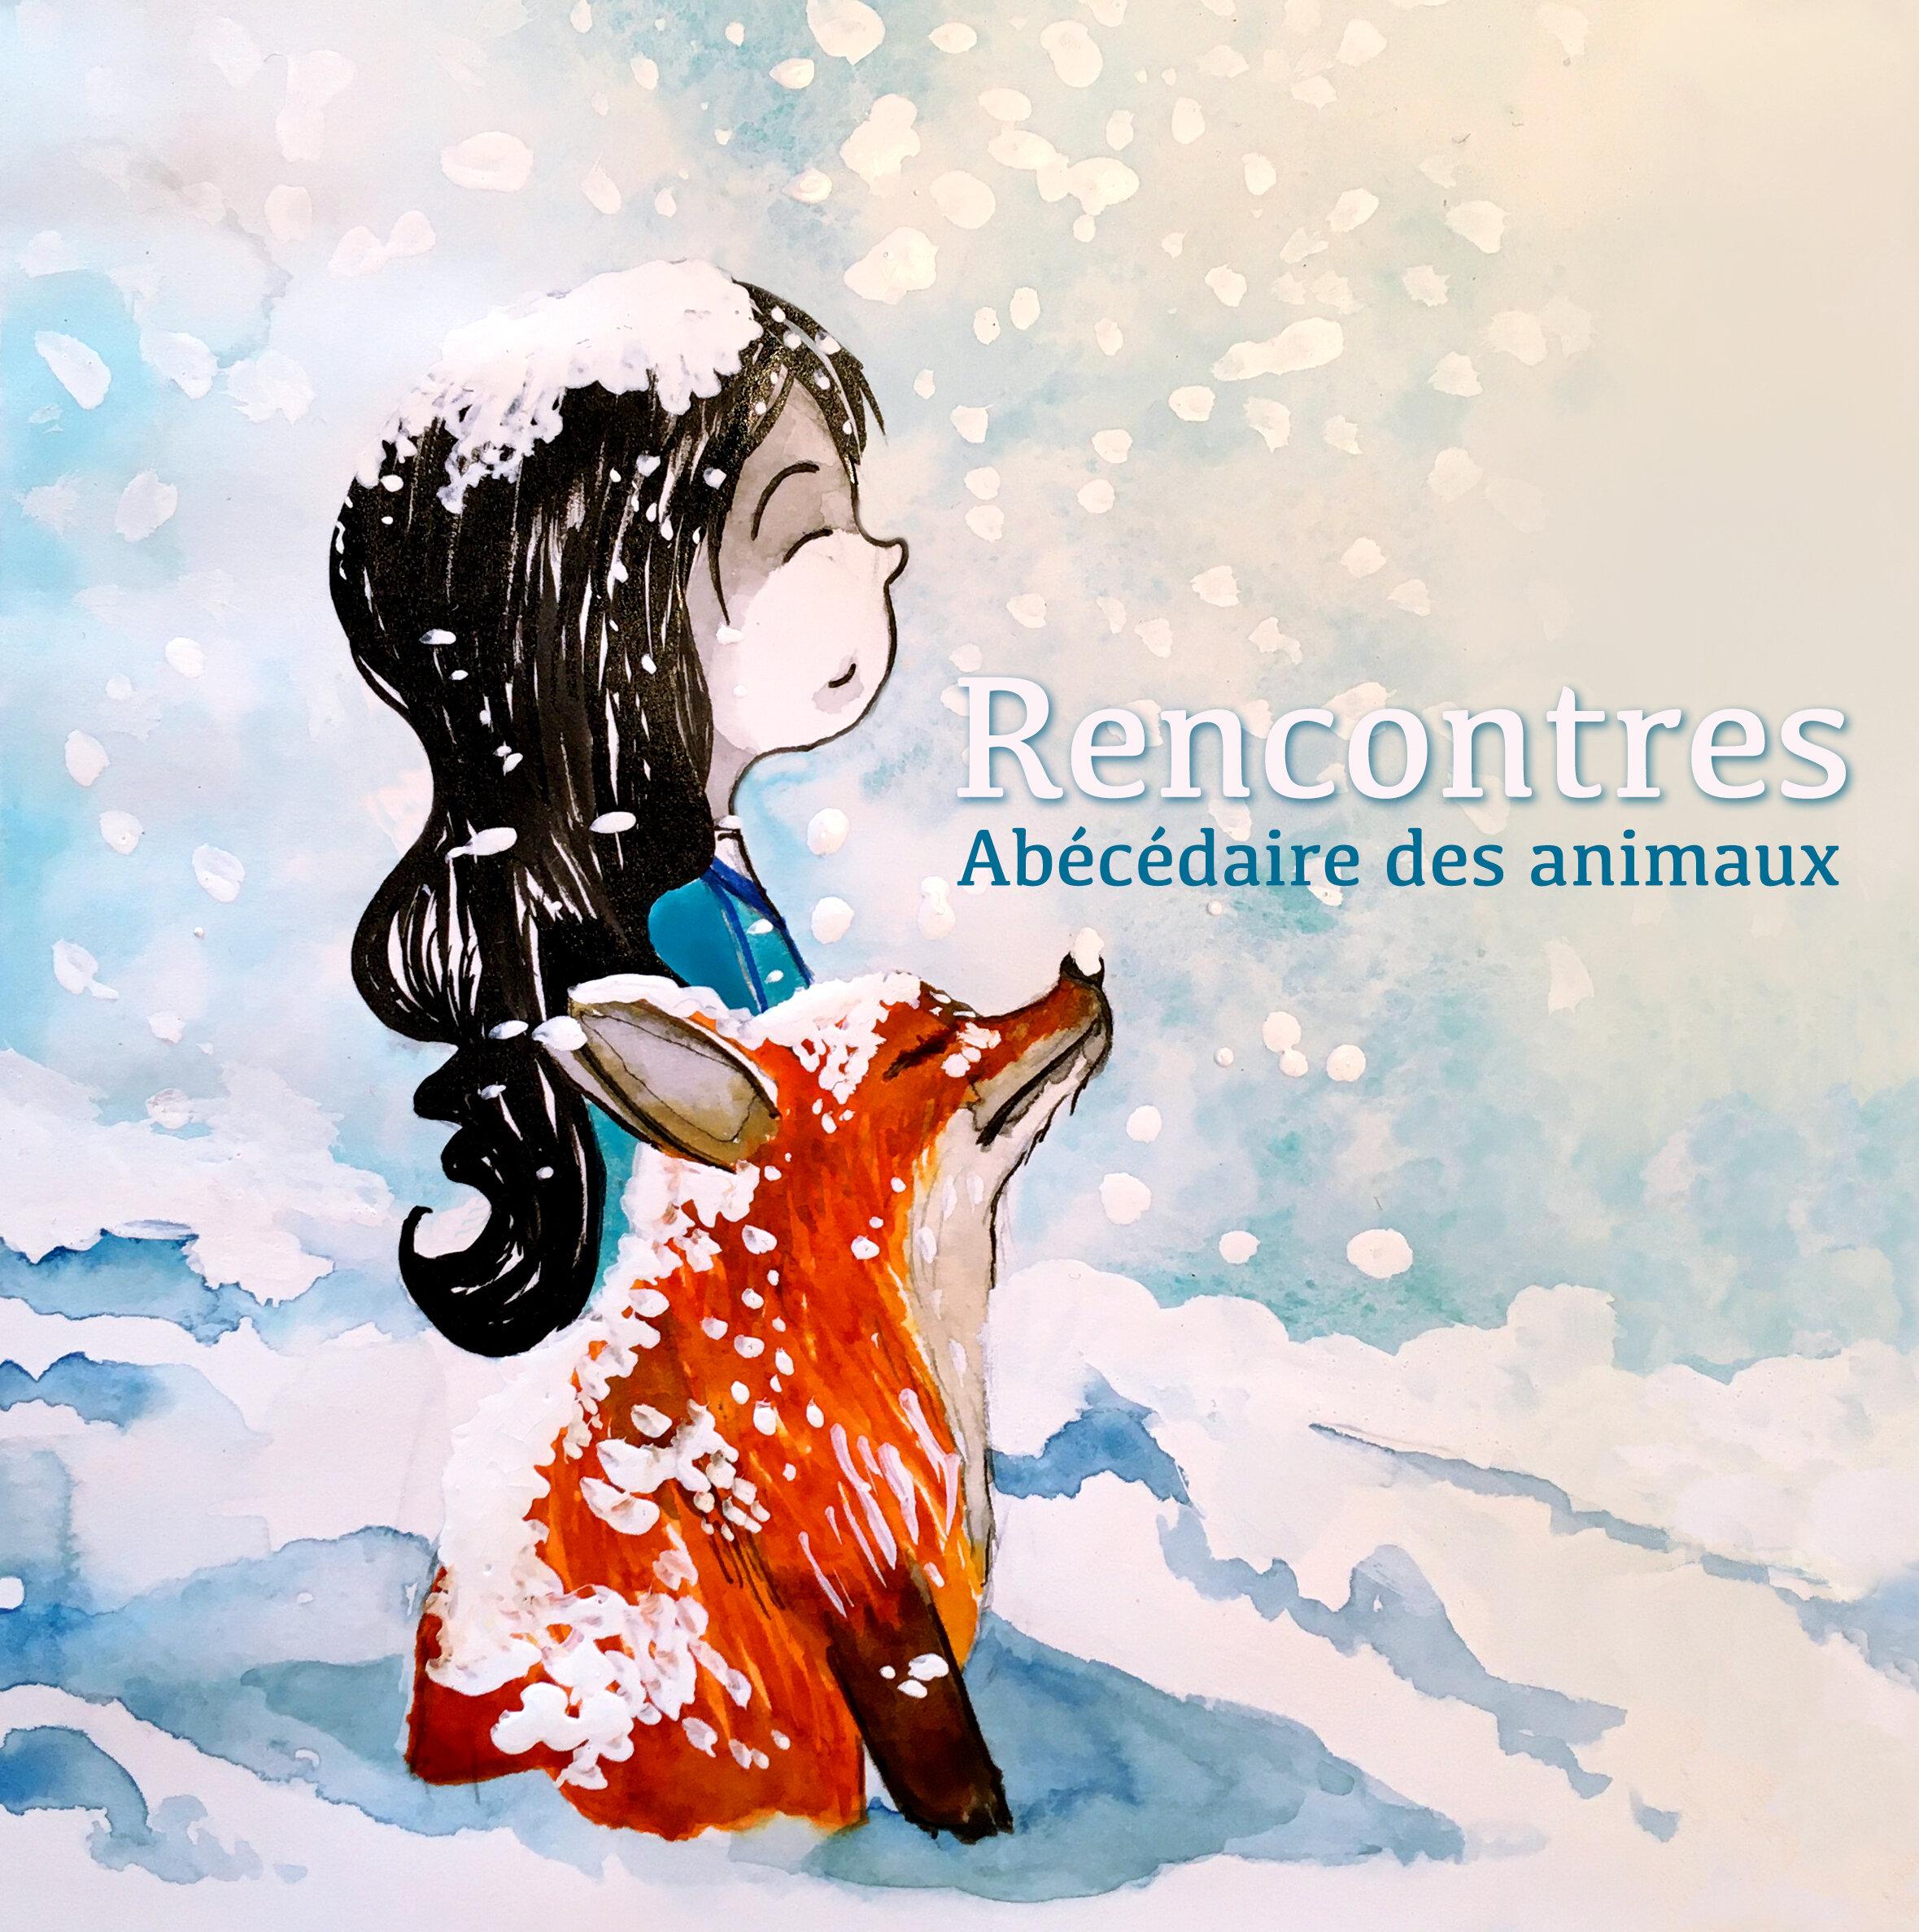 Rencontres Abecedaire Des Animaux Editions Les Tardigrades